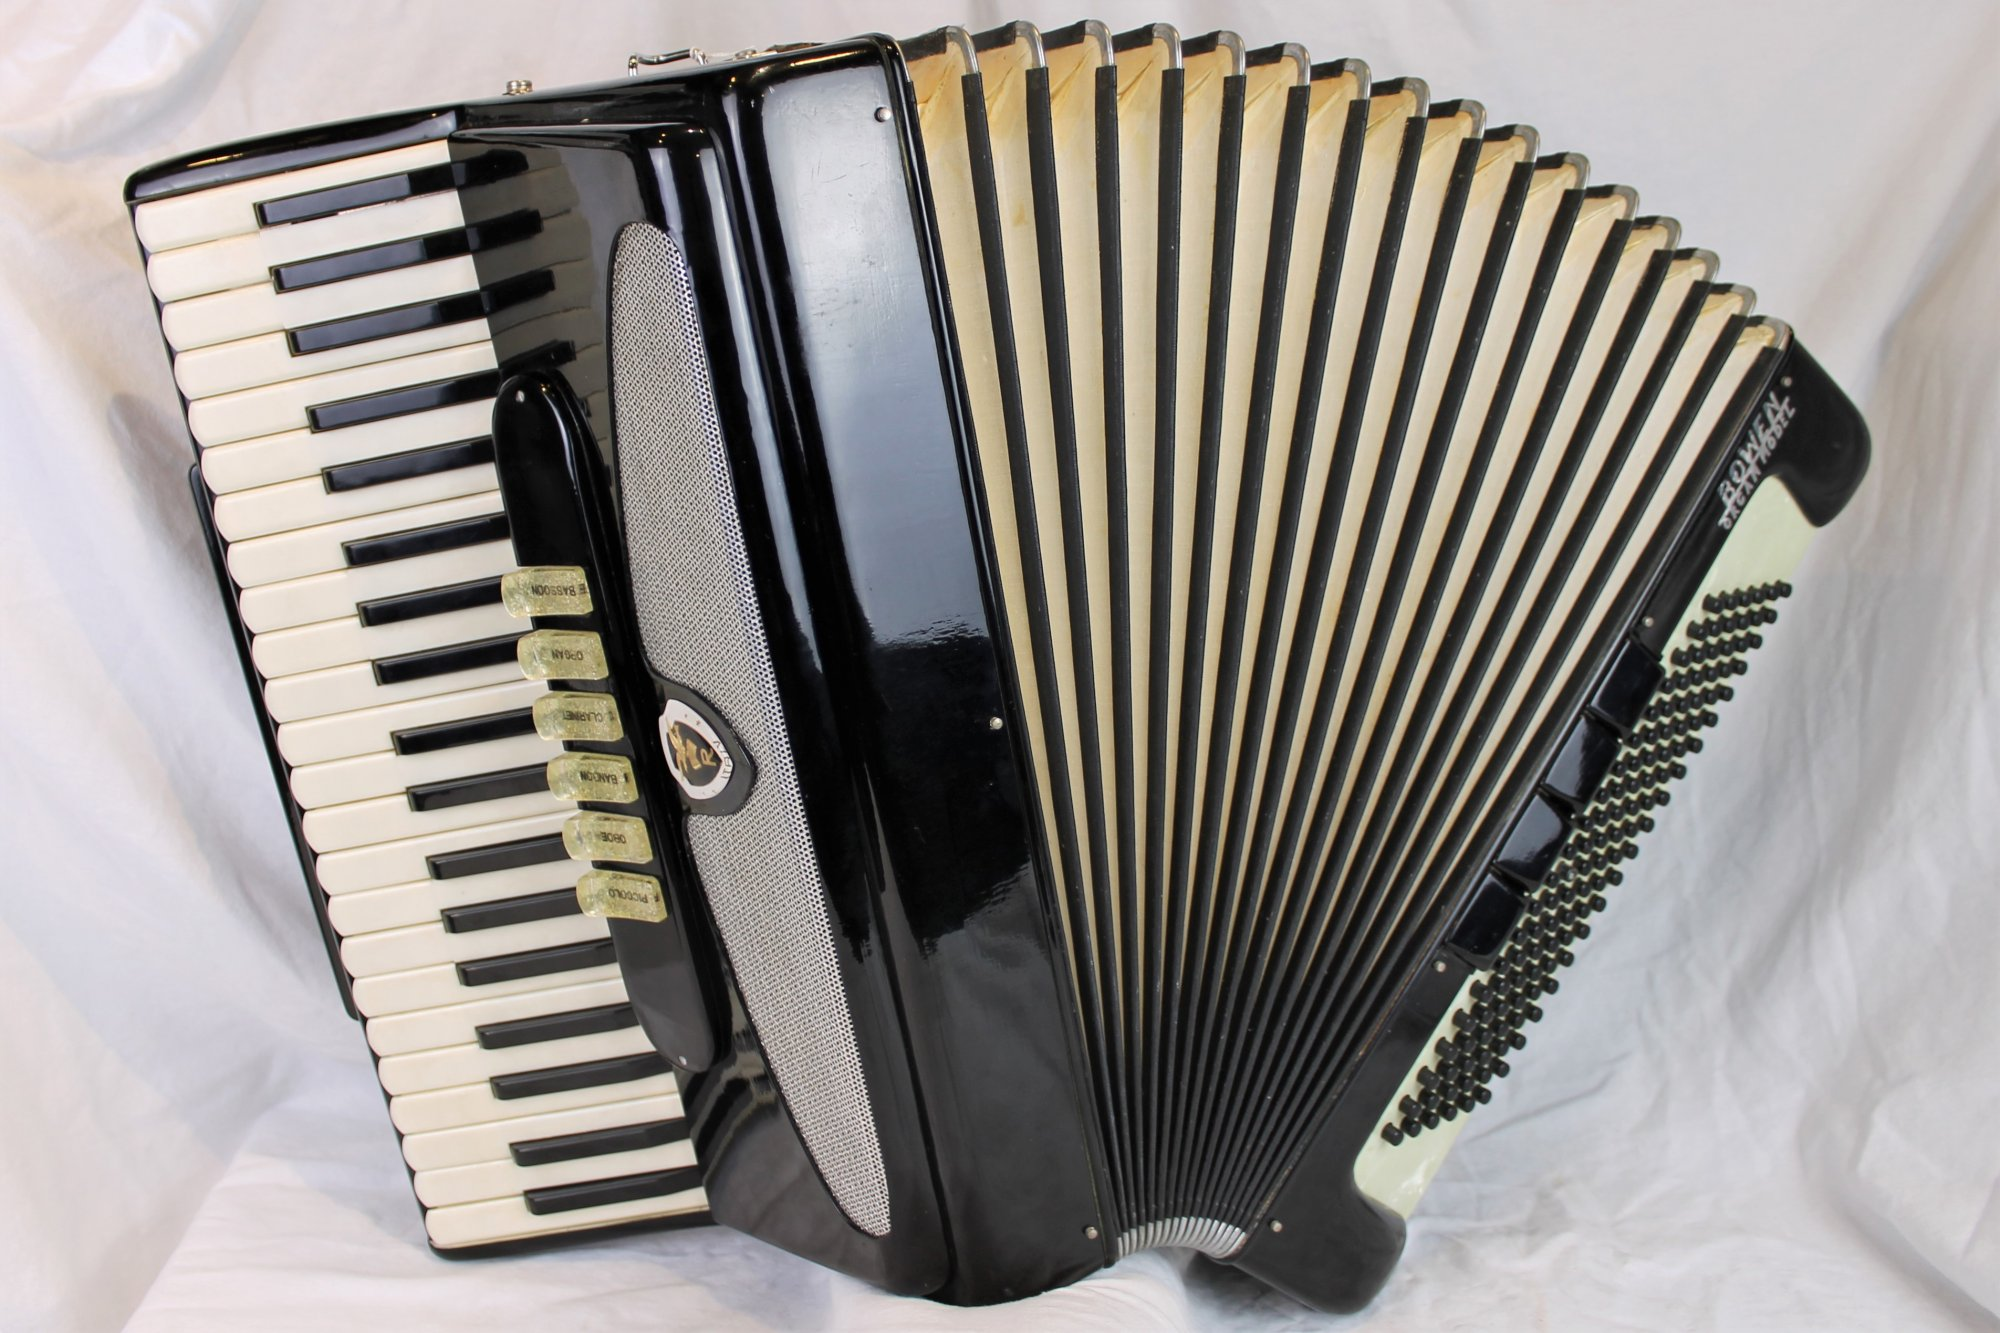 4398 - Black Bowen Organ Model 745 Piano Accordion LMH 41 120